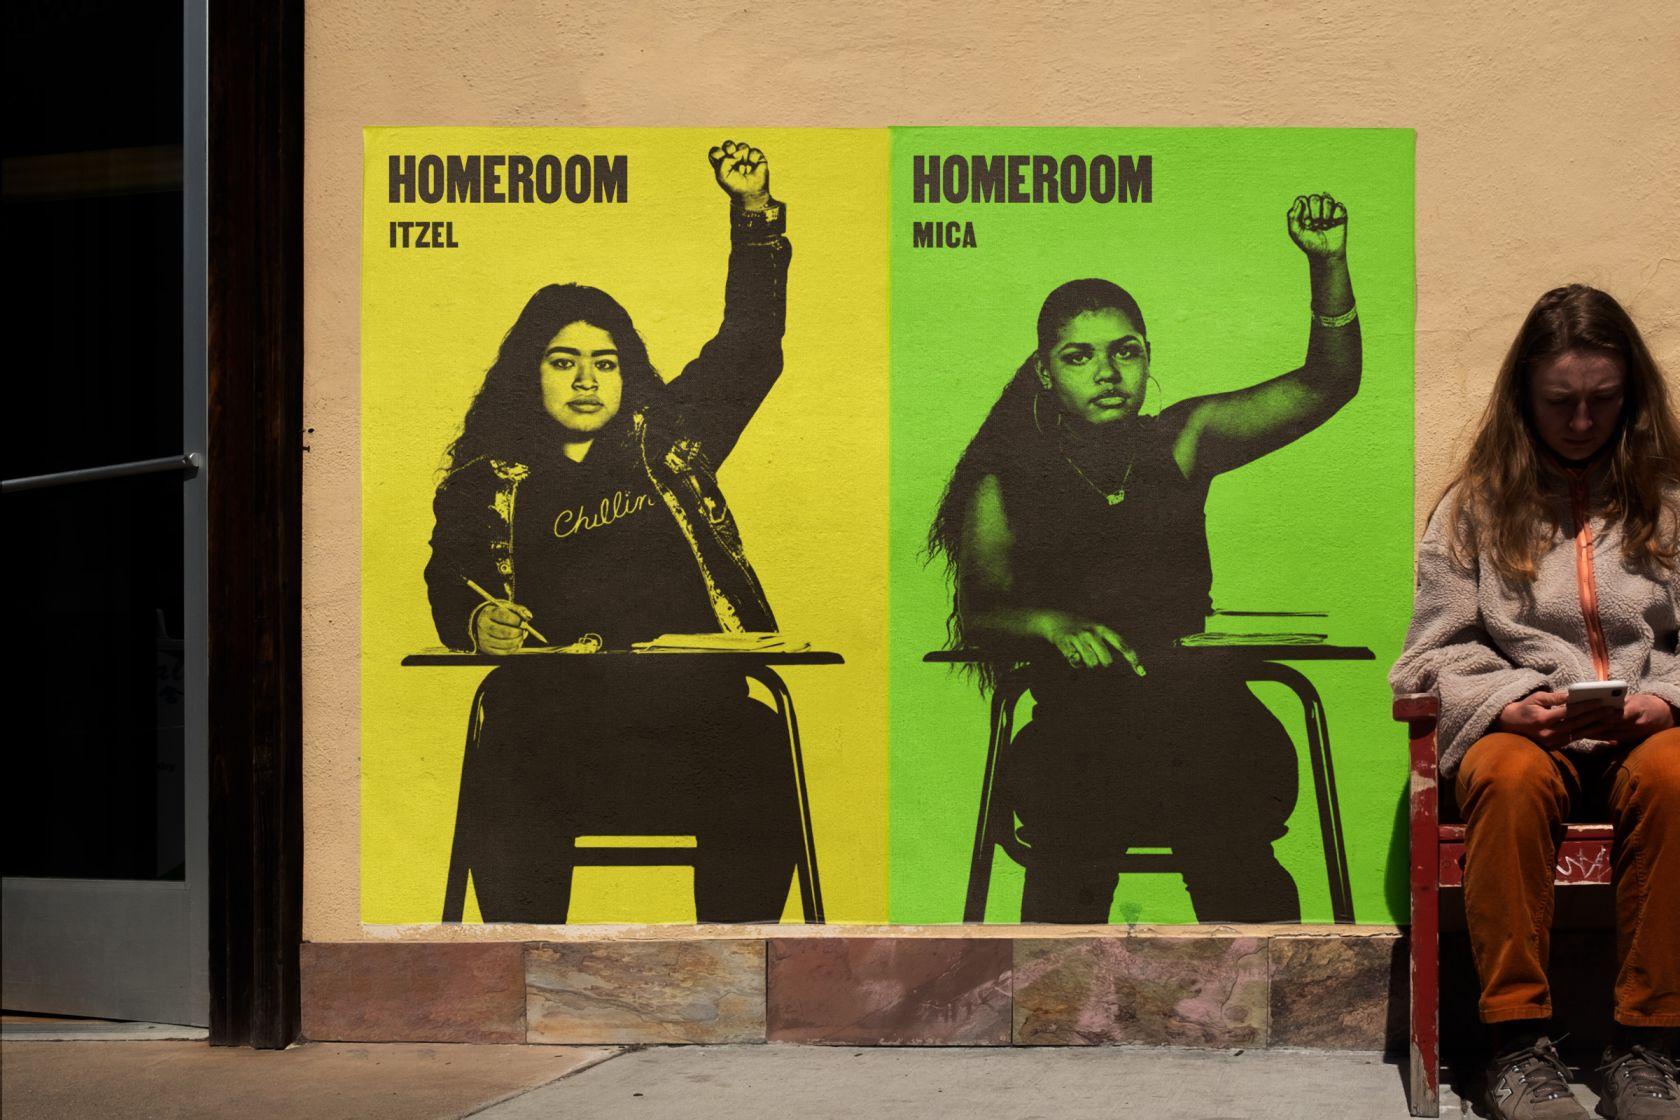 Studio Mucho's powerful campaign for Sundance-winning documentary Homeroom